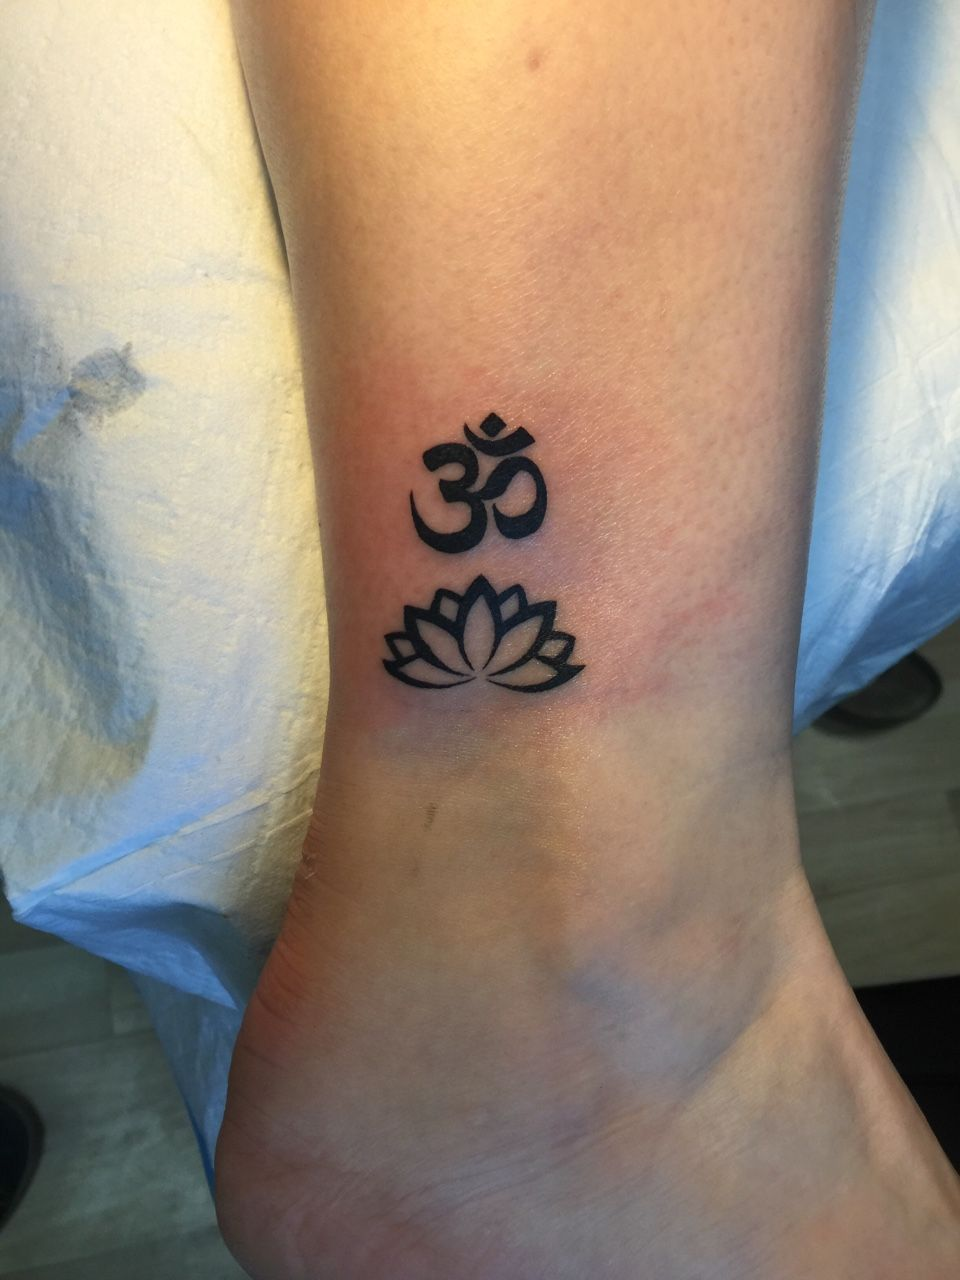 om lotus tattoo - Google Search More